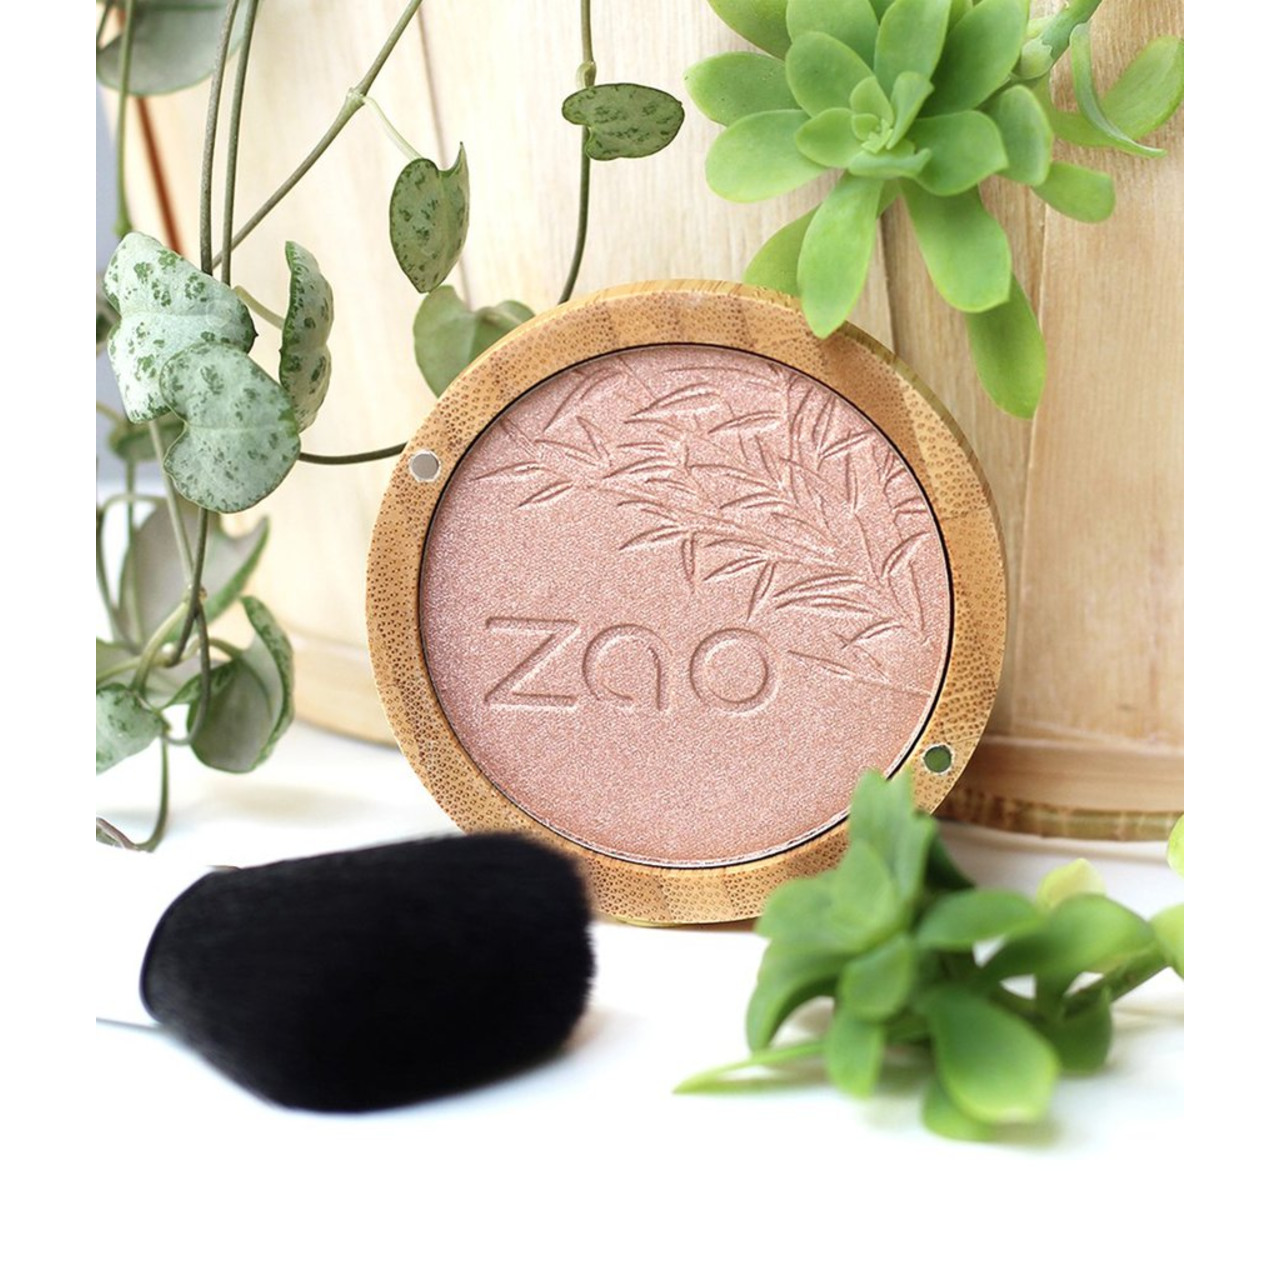 ZAO Organic - Хайлайтър Shine-up DUO - 9гр.-Copy